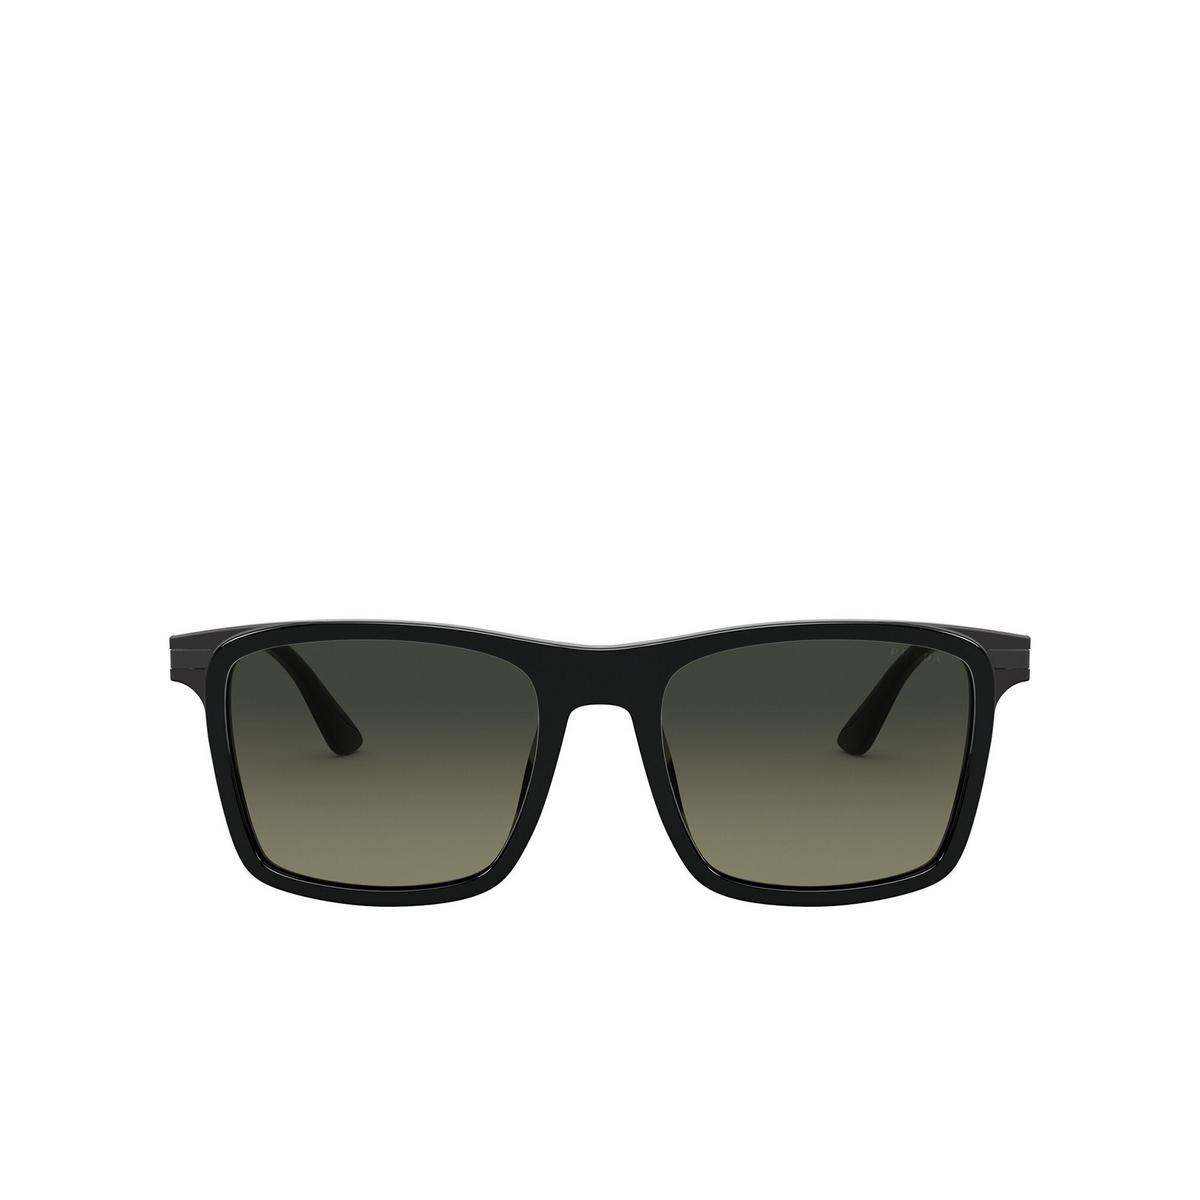 Prada® Square Sunglasses: PR 19XS color Black 07F09G - front view.